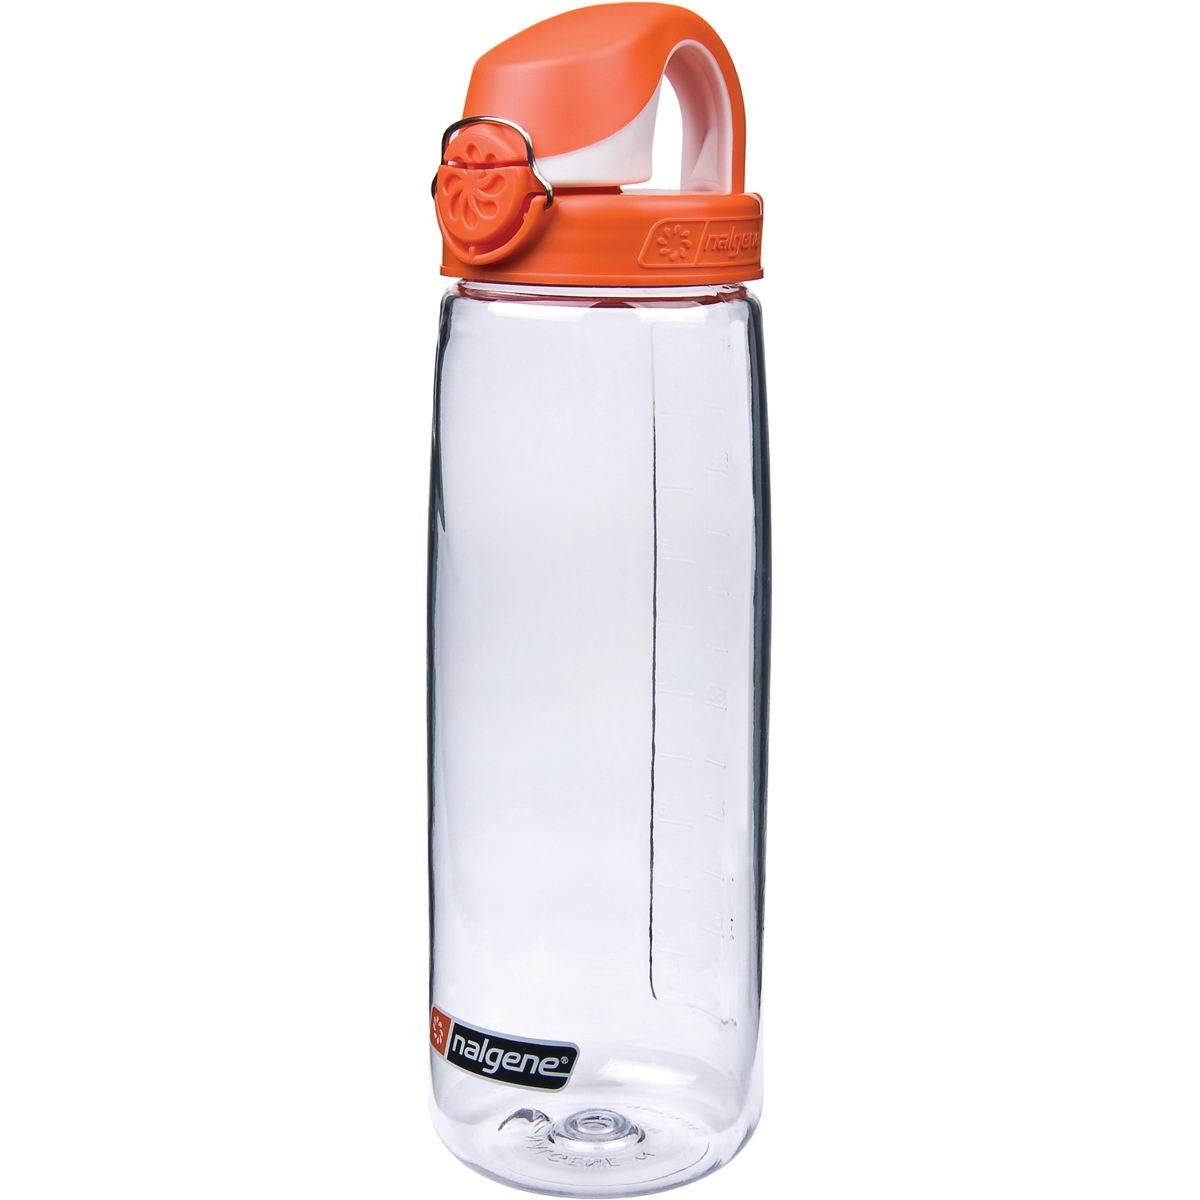 Nalgene Everyday OTF 0,7 Liter Trinkflasche transparent-orange